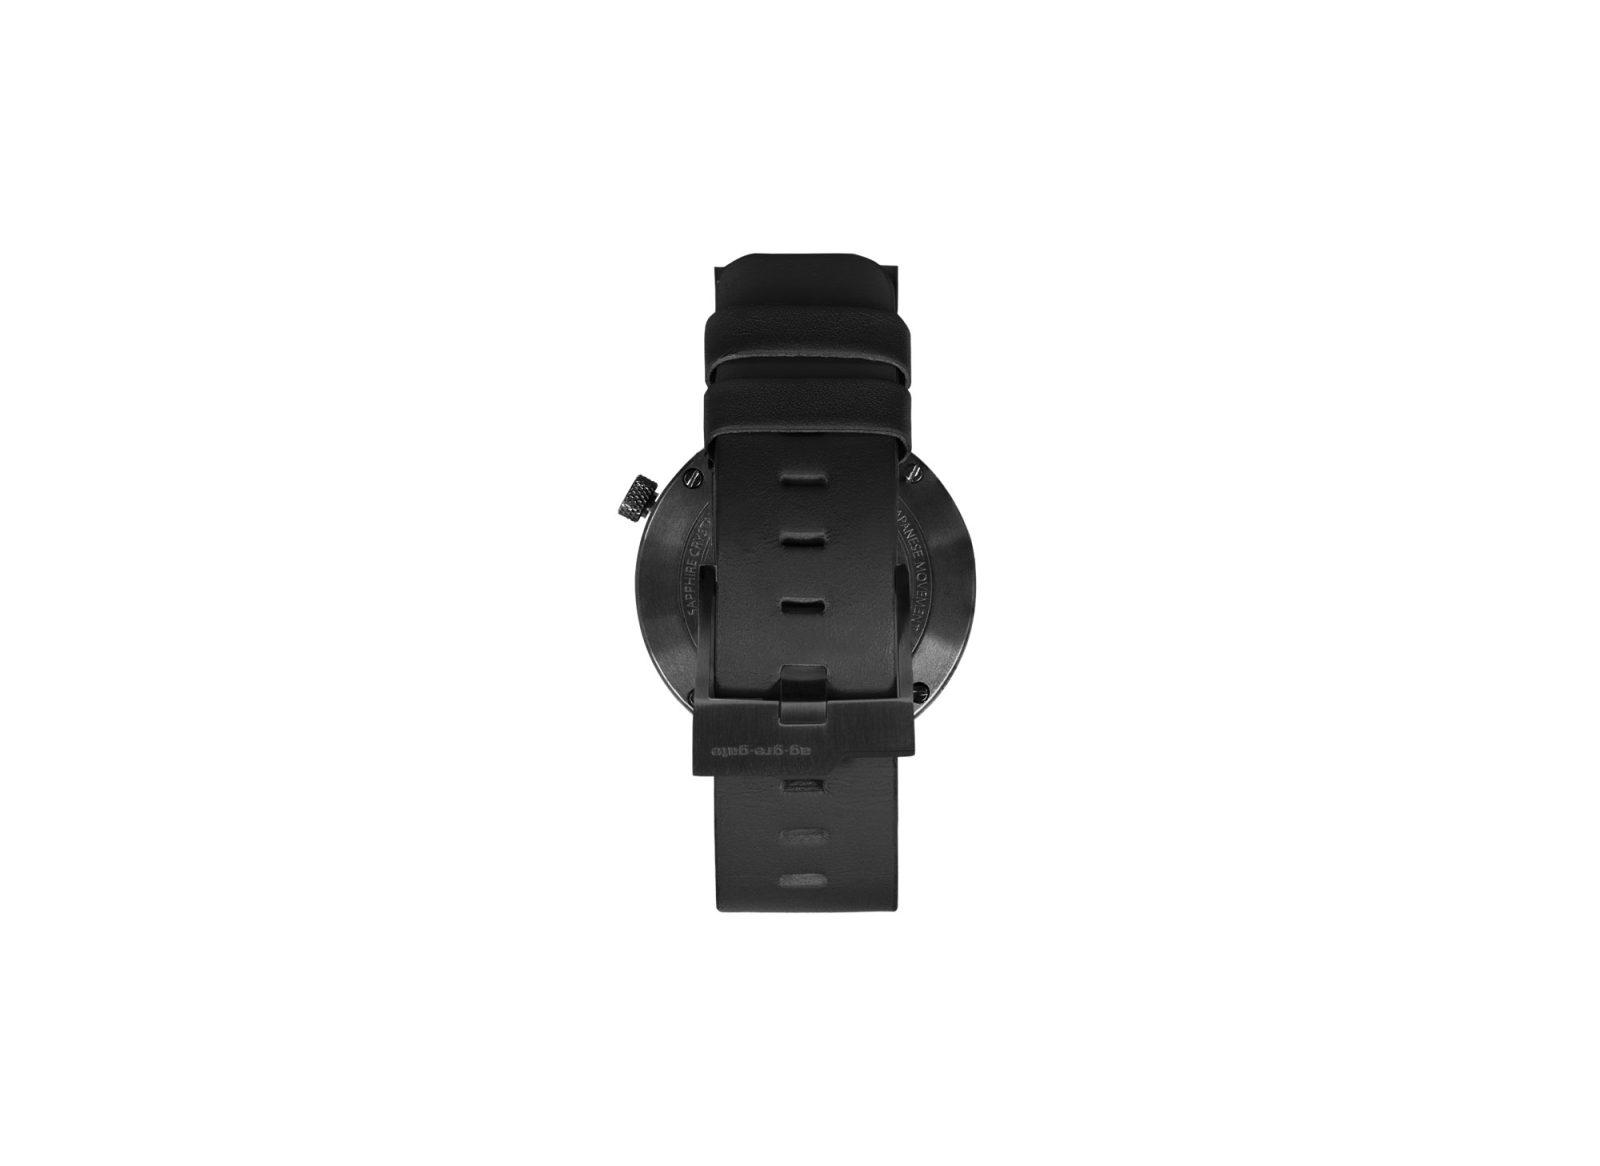 The Masonic Concrete Watch, Charcoal Black-34911